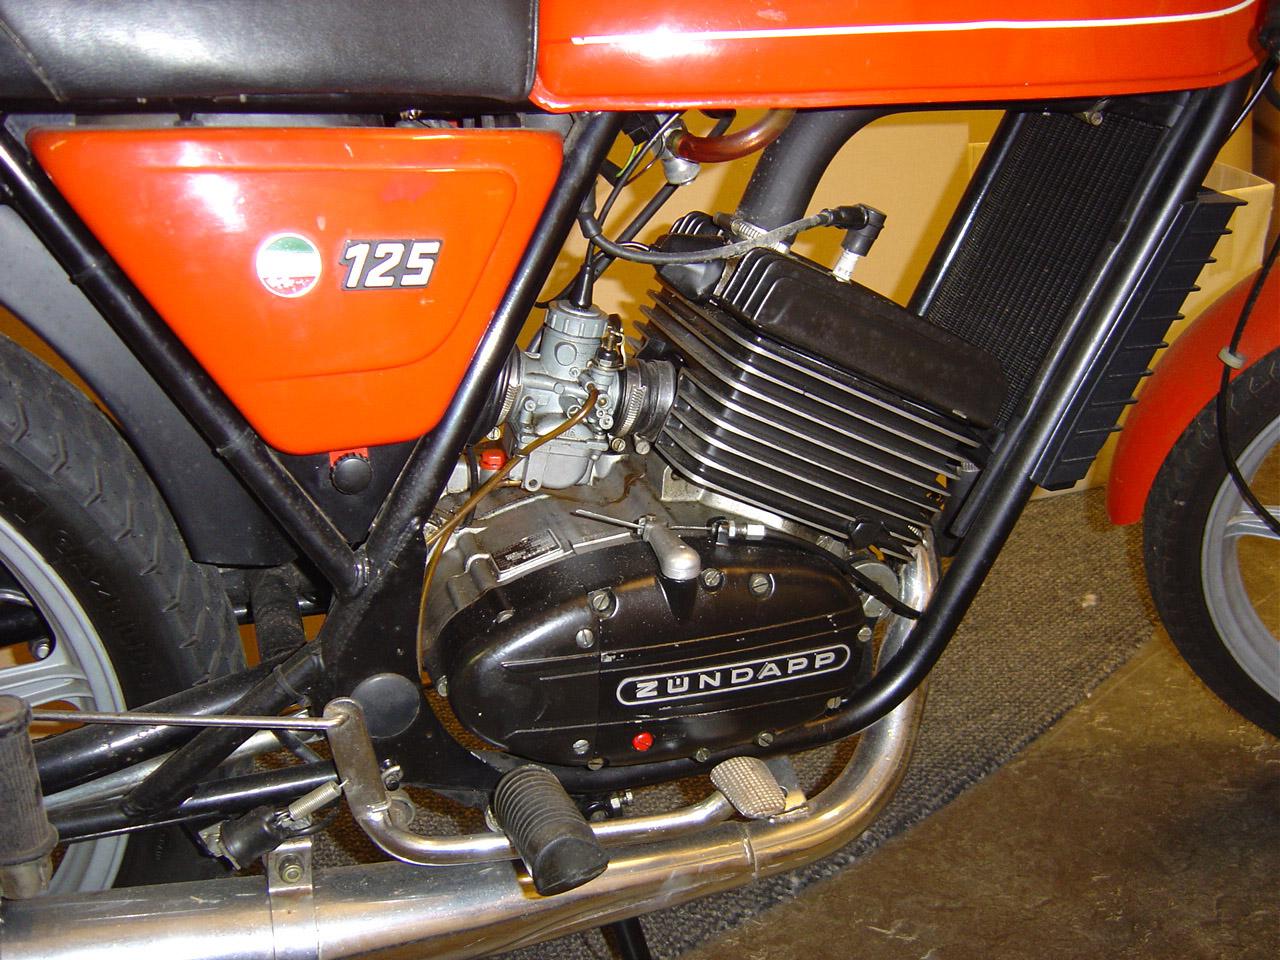 laverda_125_zundapp_motore